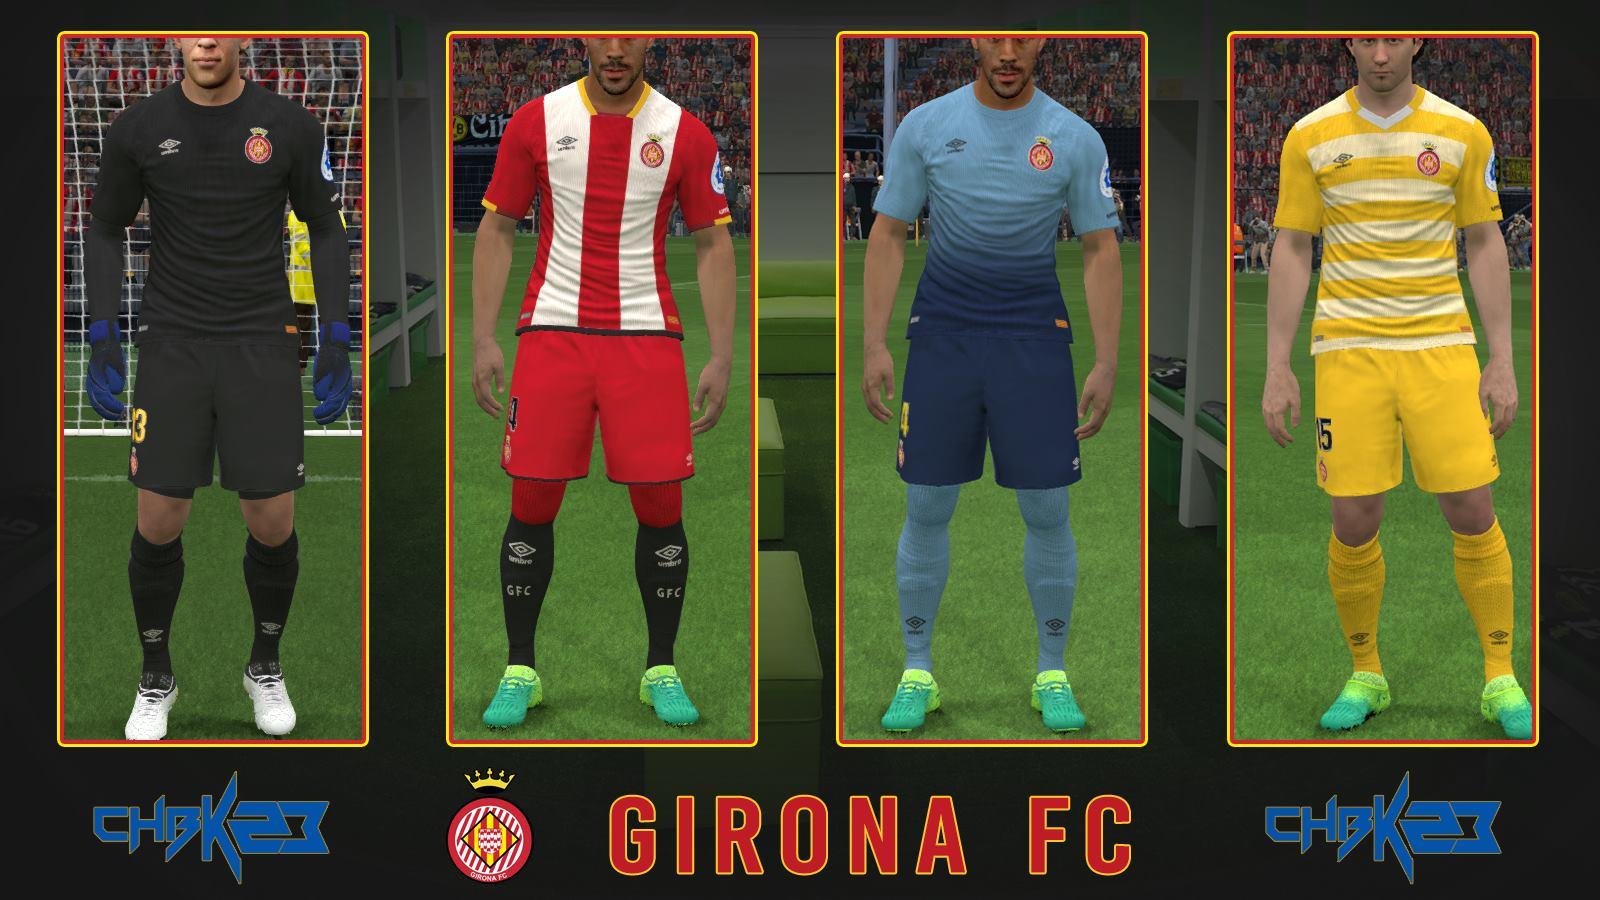 PES 2017 Kitset 2017/18 Girona FC  by Charliebk23